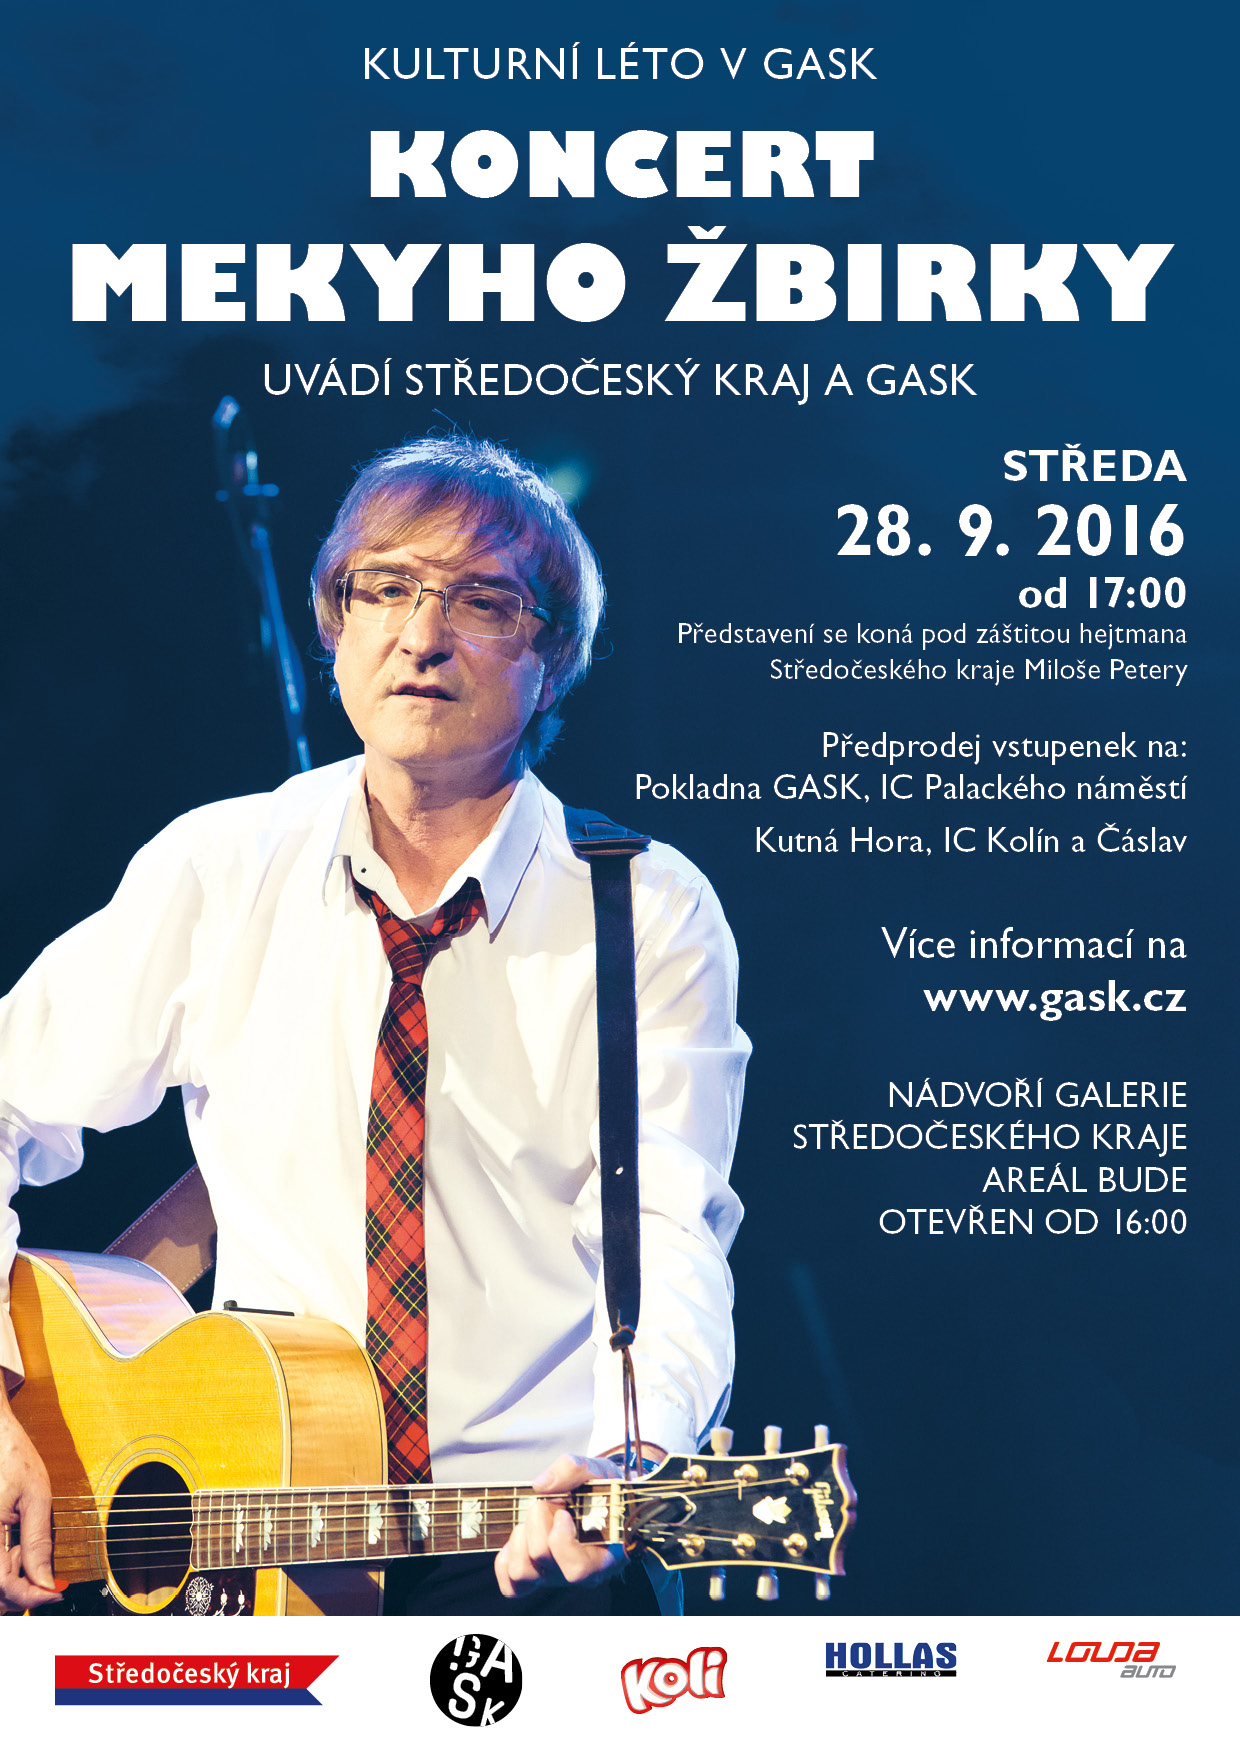 512-a4-meky-zbirka-2016-web.jpg